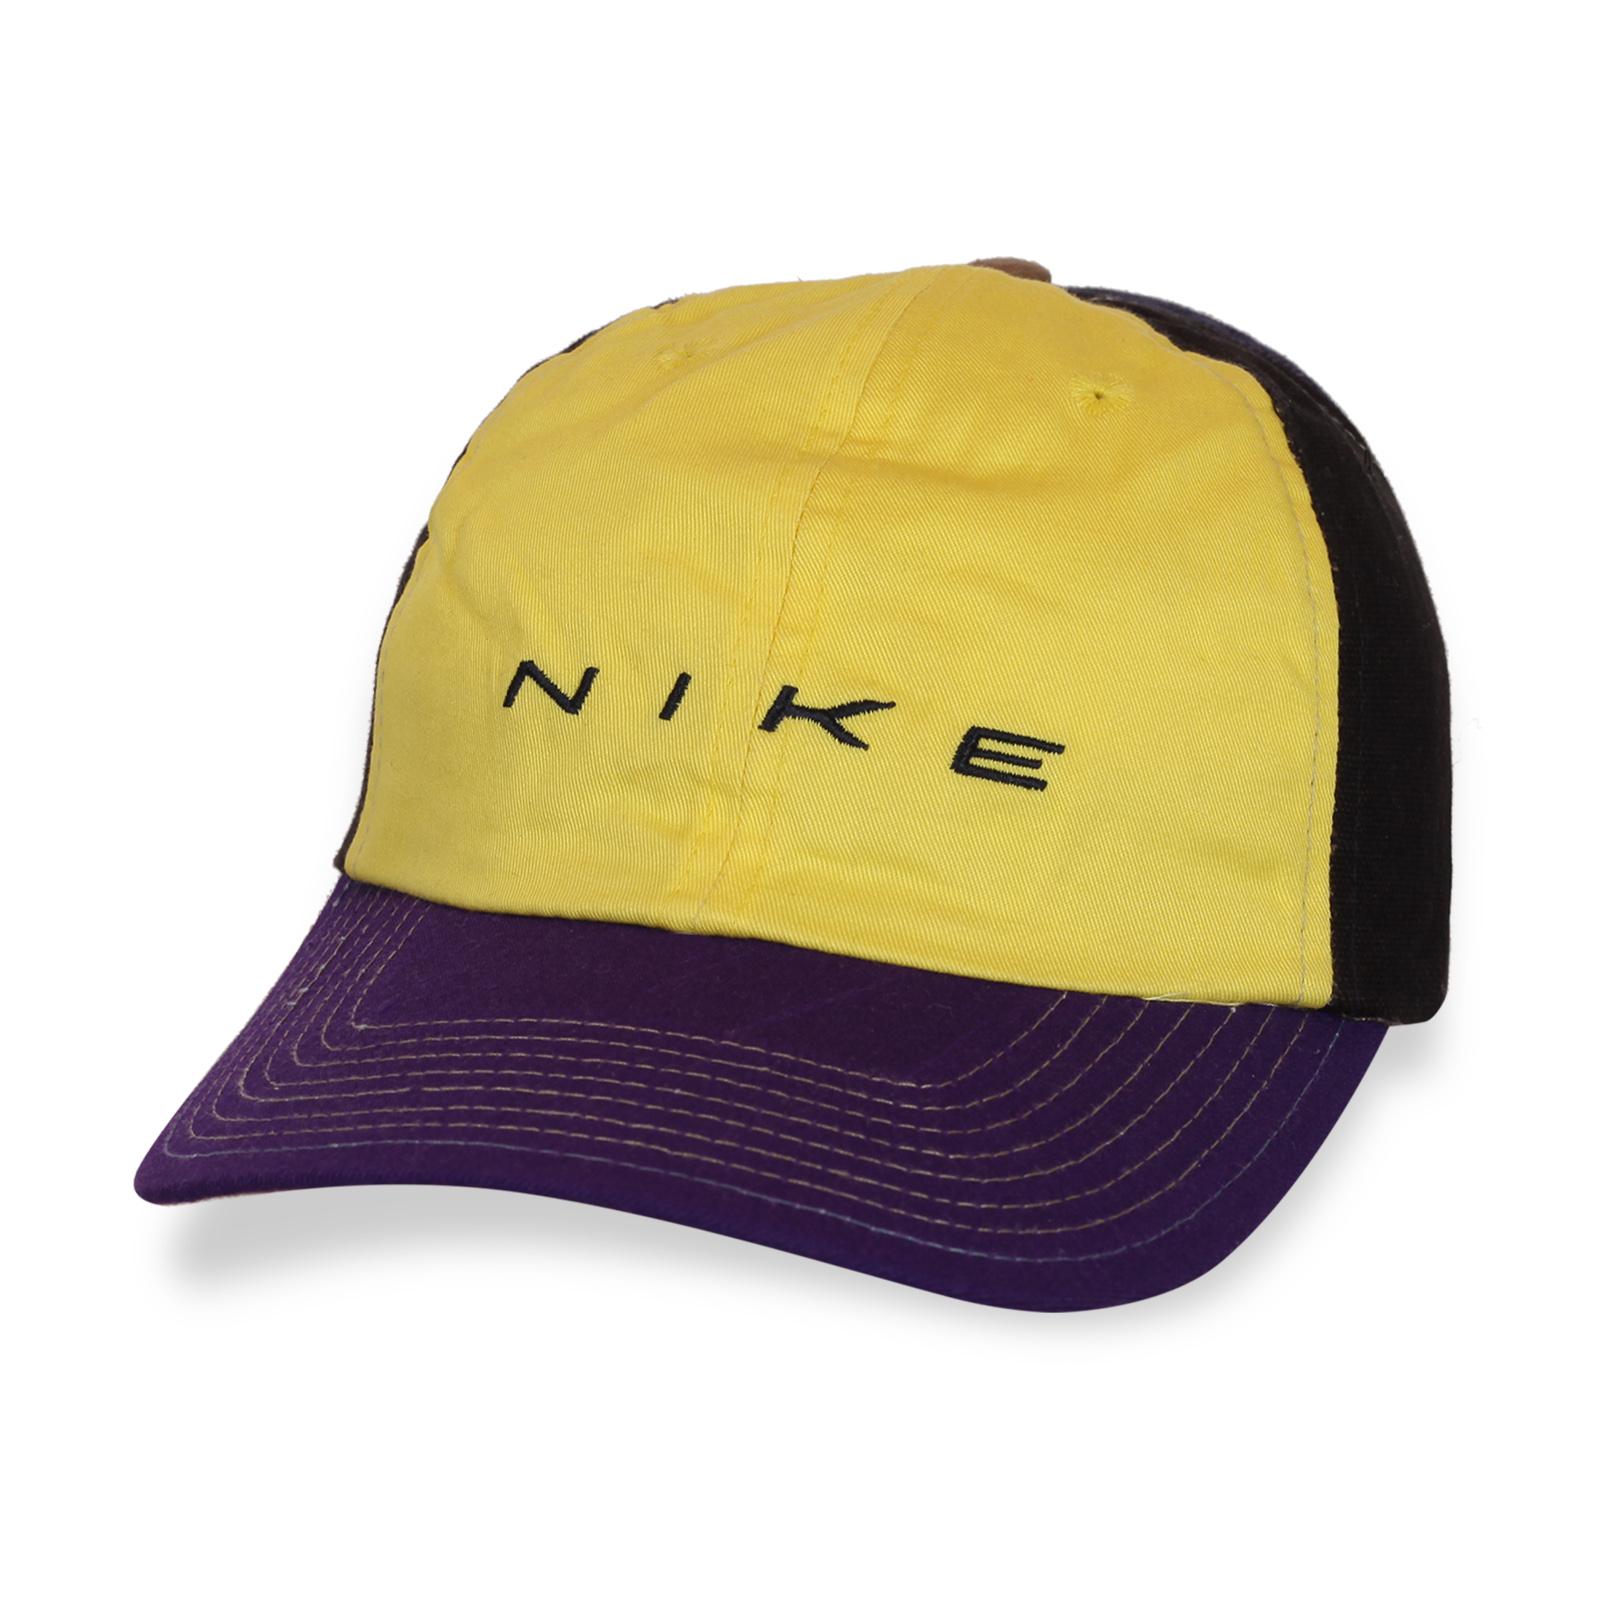 Зачётная кепка на лето